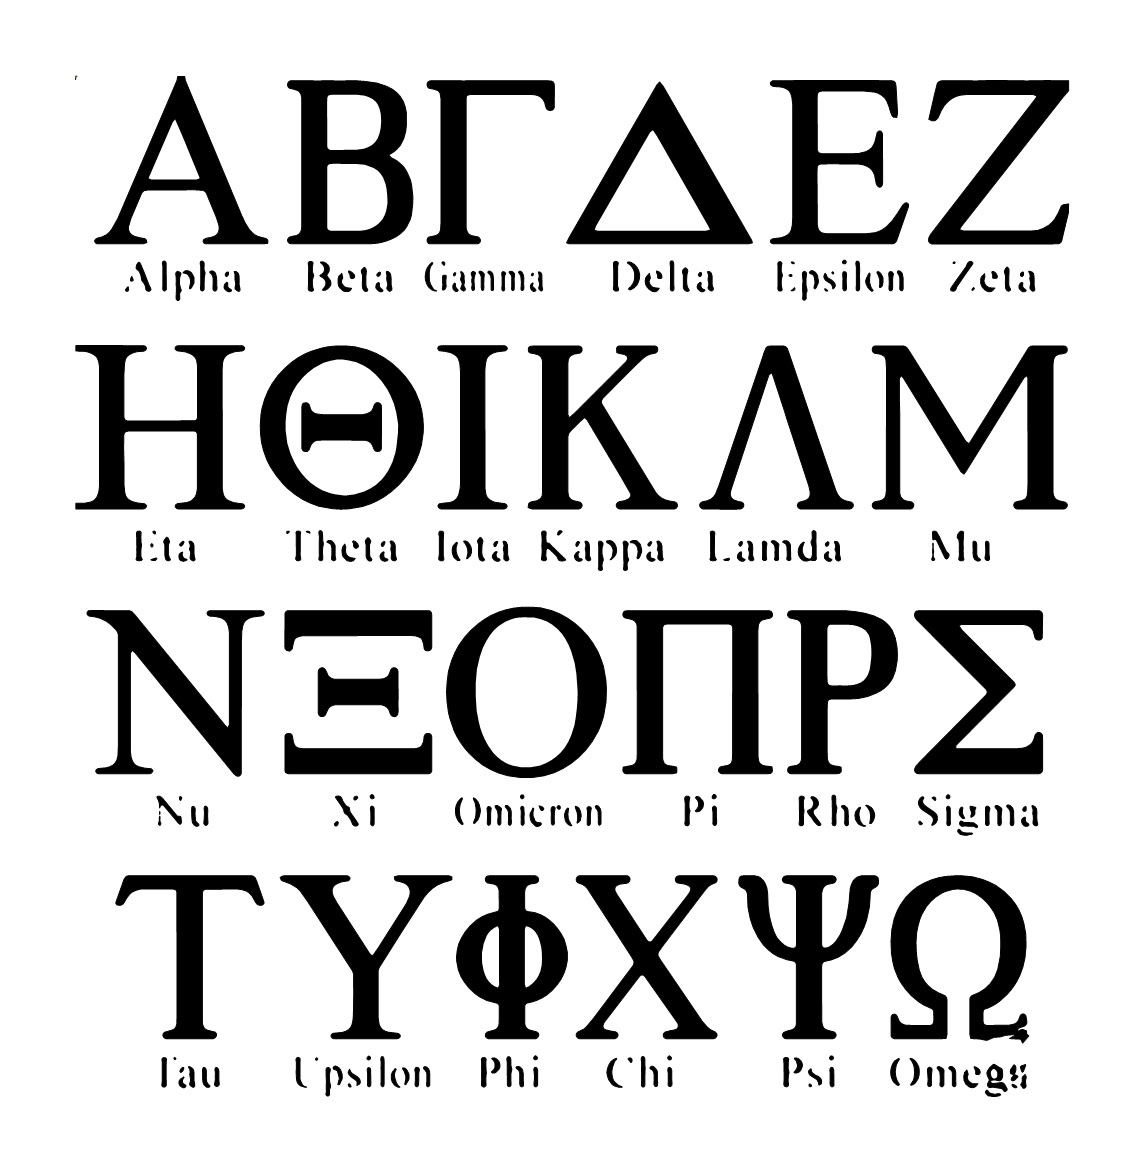 Gw Admissions Student Blog Alternative Greek